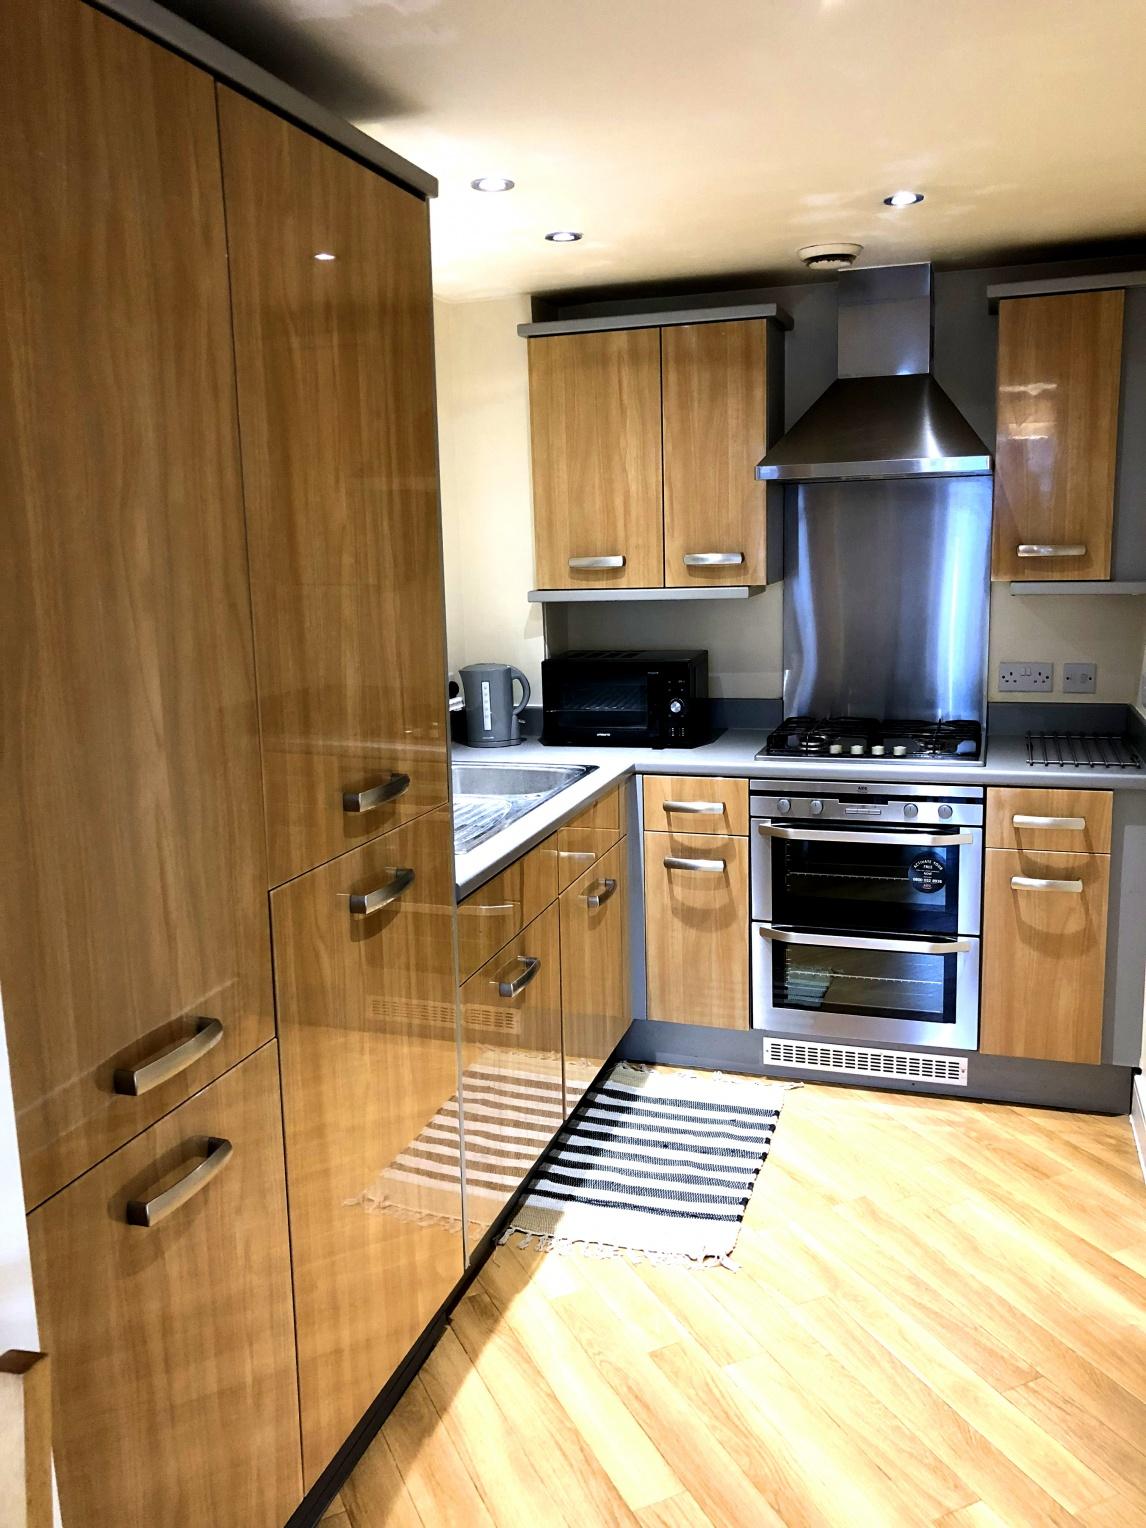 Invito House, 1-7 Bramley Crescent, Gants Hill, Essex, IG2 6NU